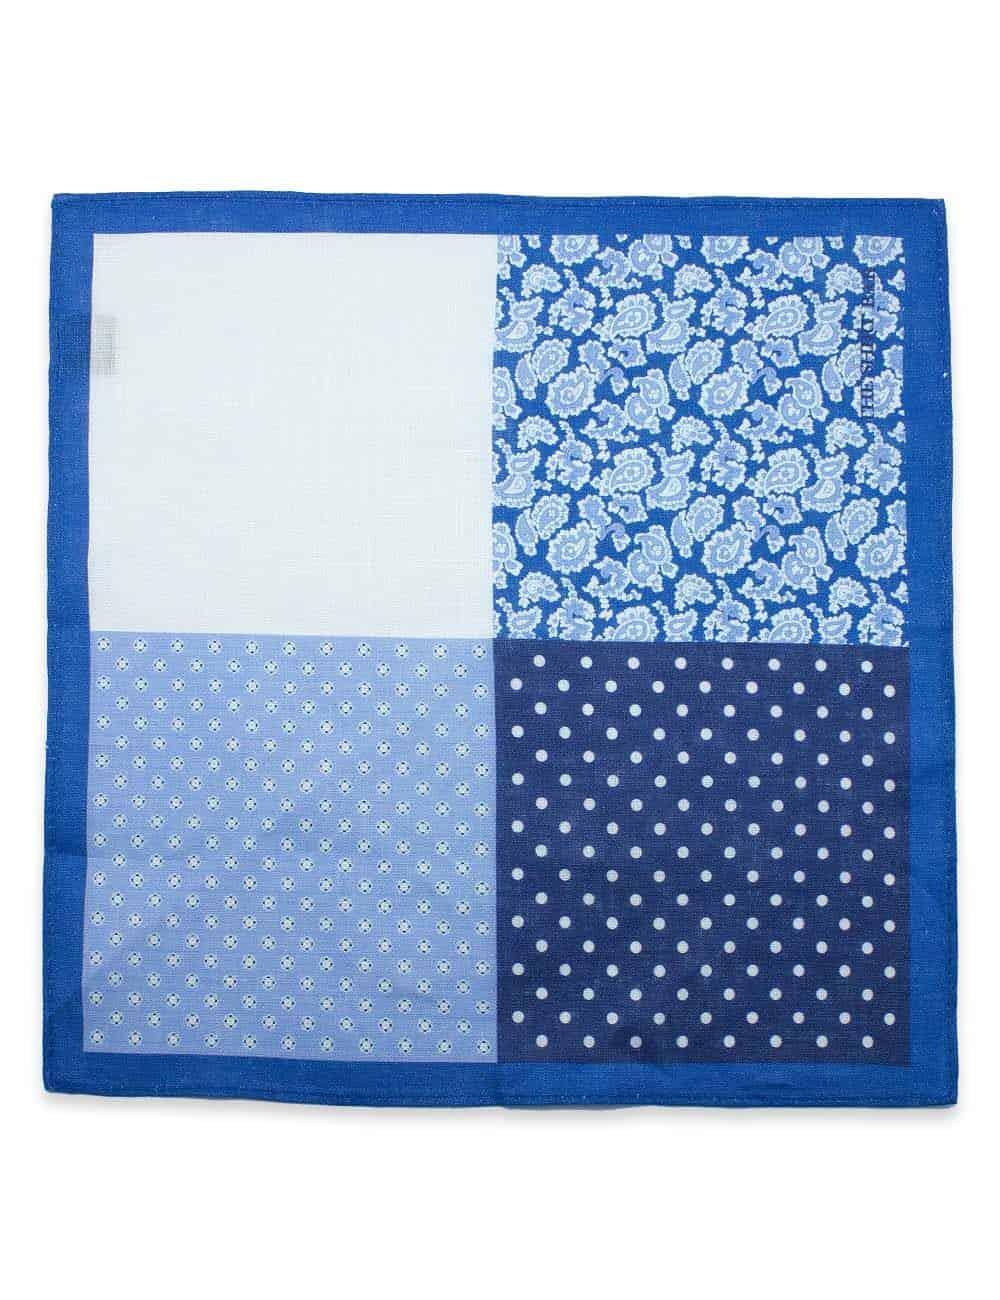 Pocket Square Gift Set K PSQGS11.14